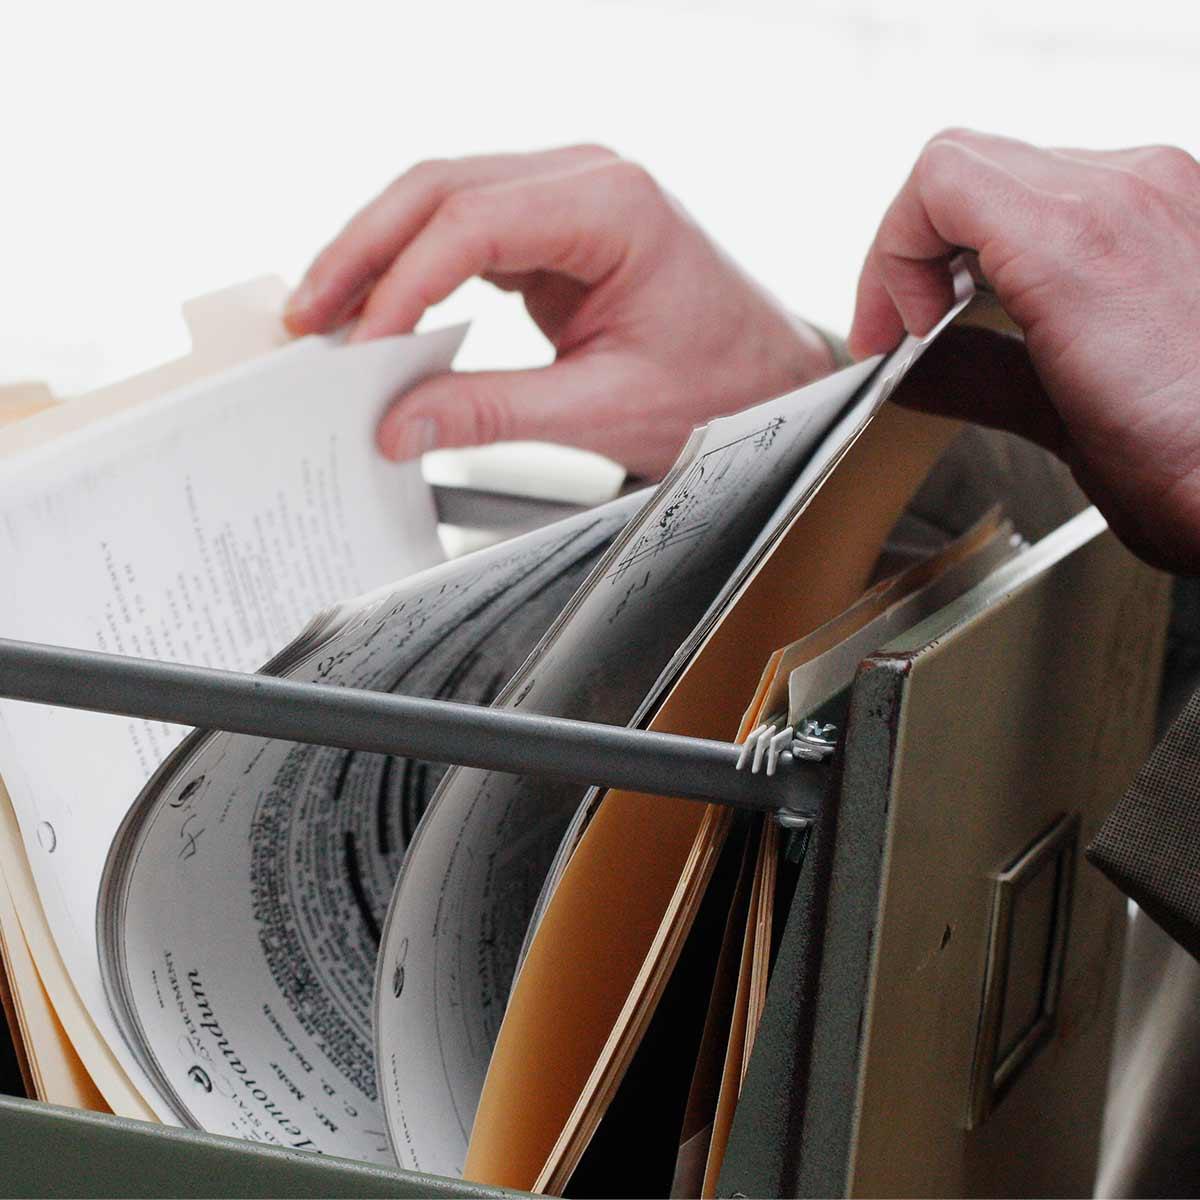 document-management-image1-1200x1200